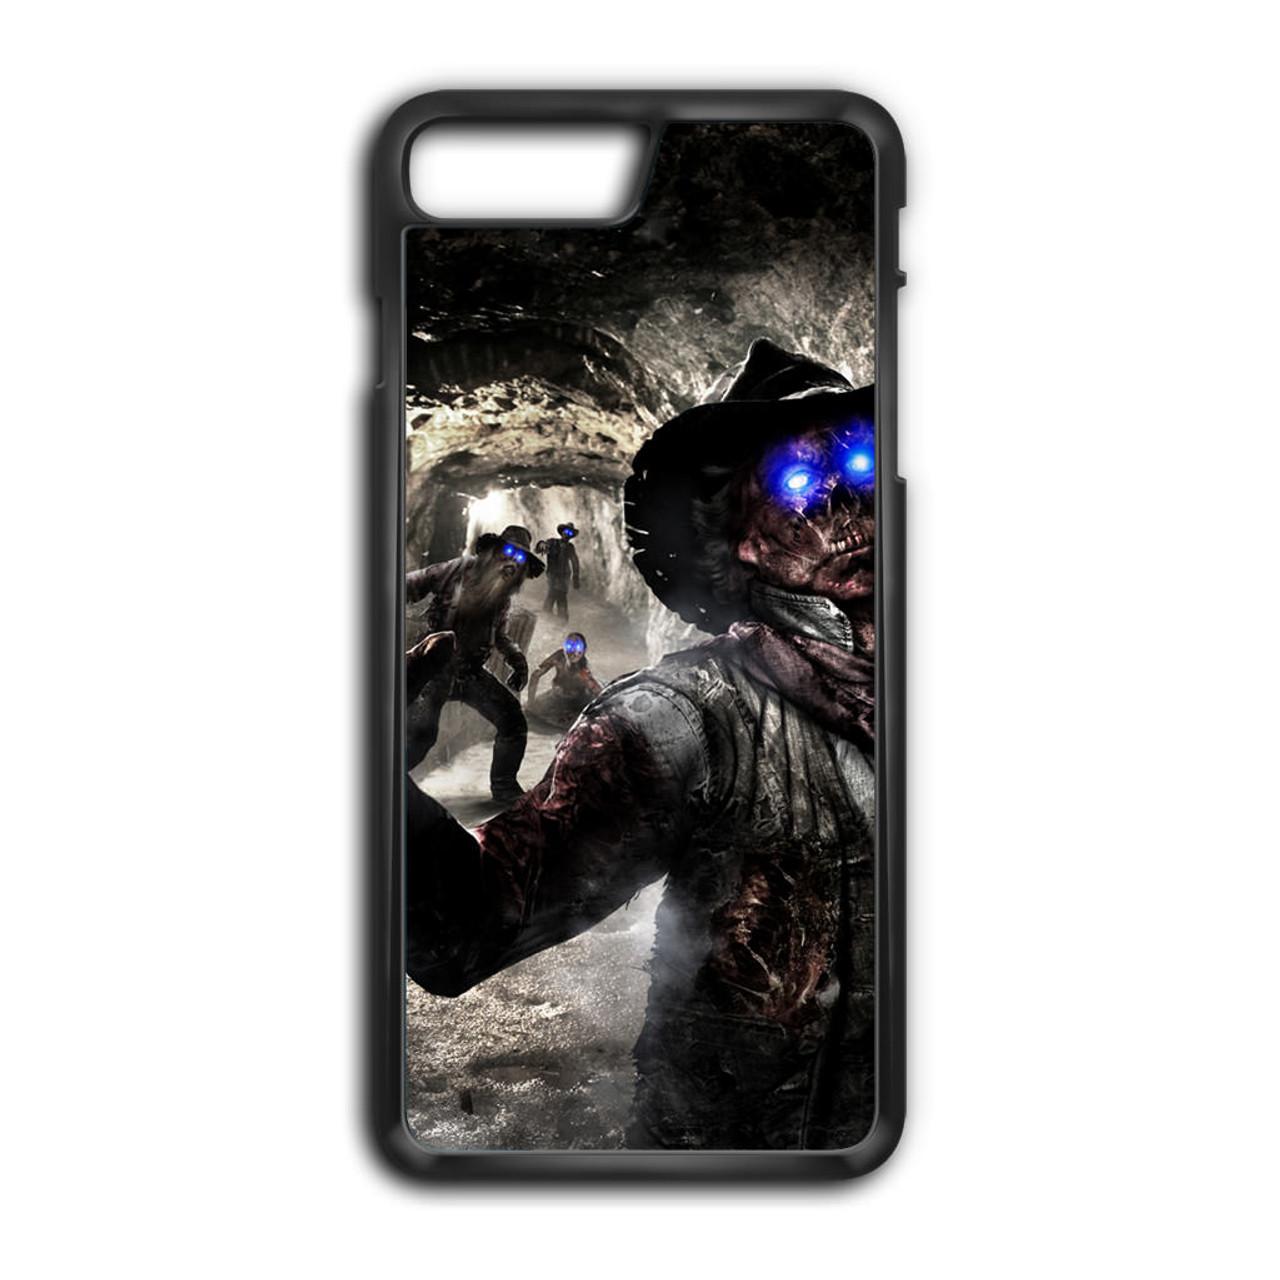 iphone 7 case black opps